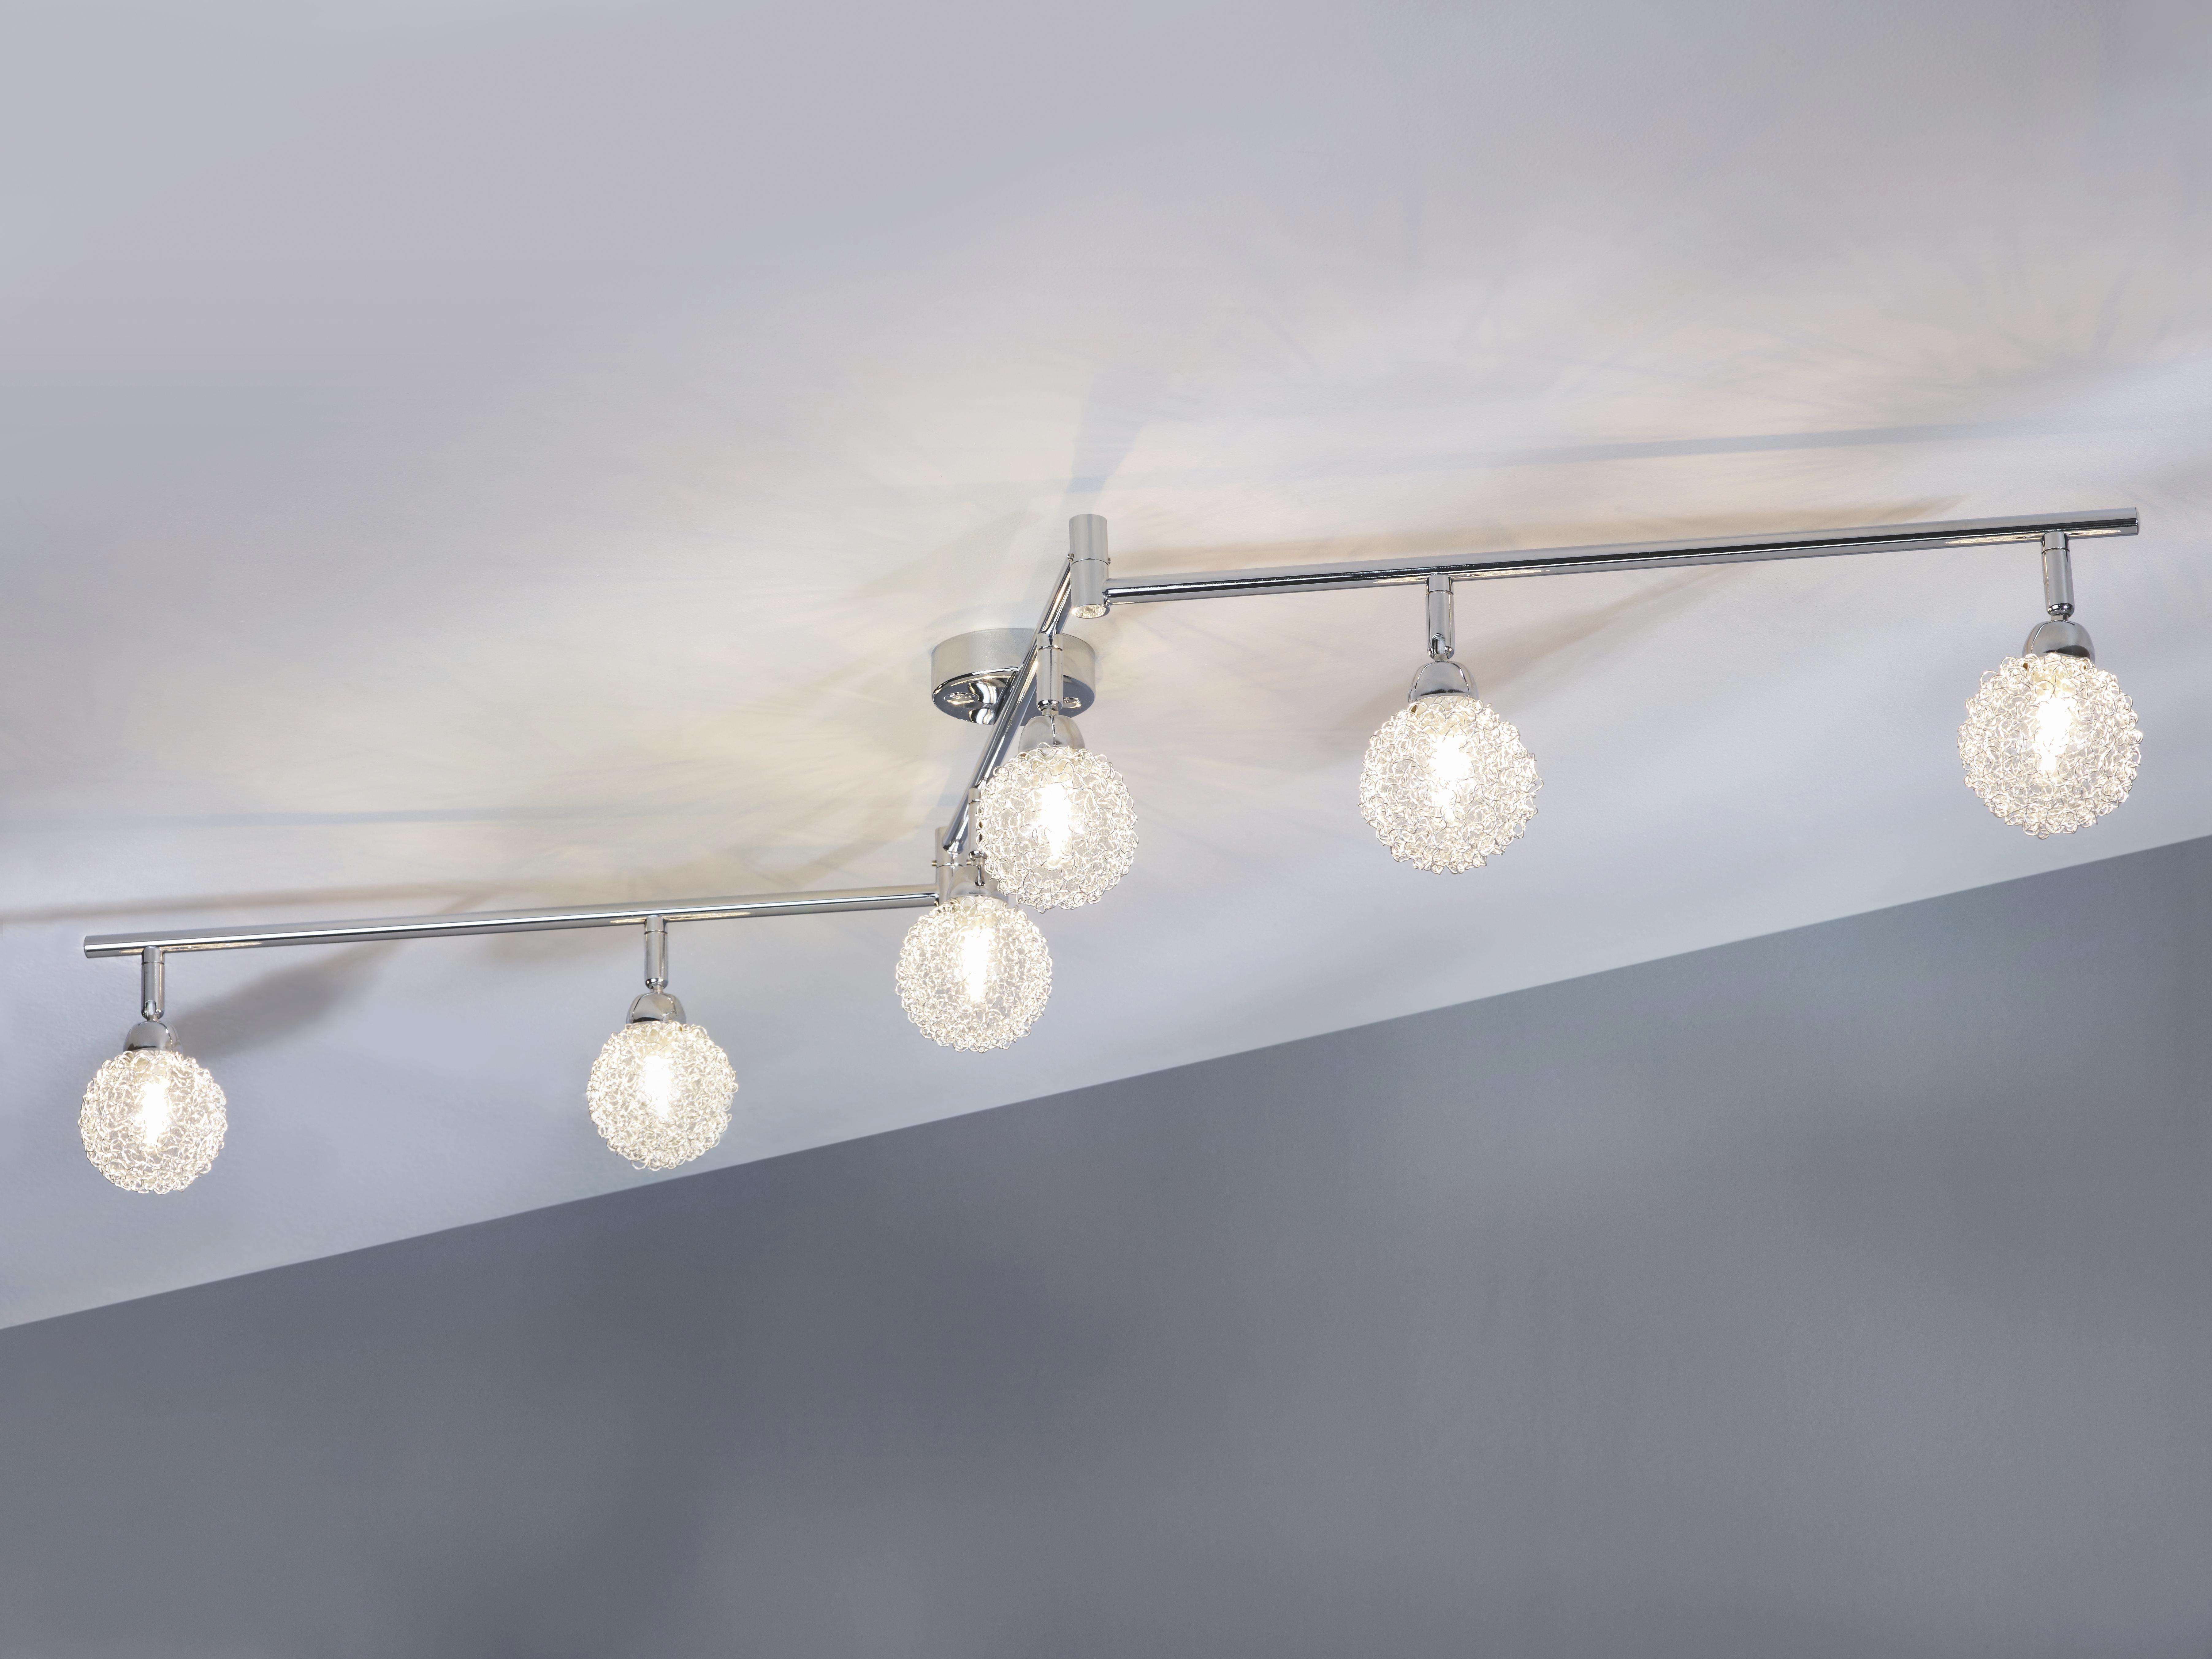 Spotlámpa Mia - krómszínű, modern, üveg/fém (145/19cm) - MÖMAX modern living